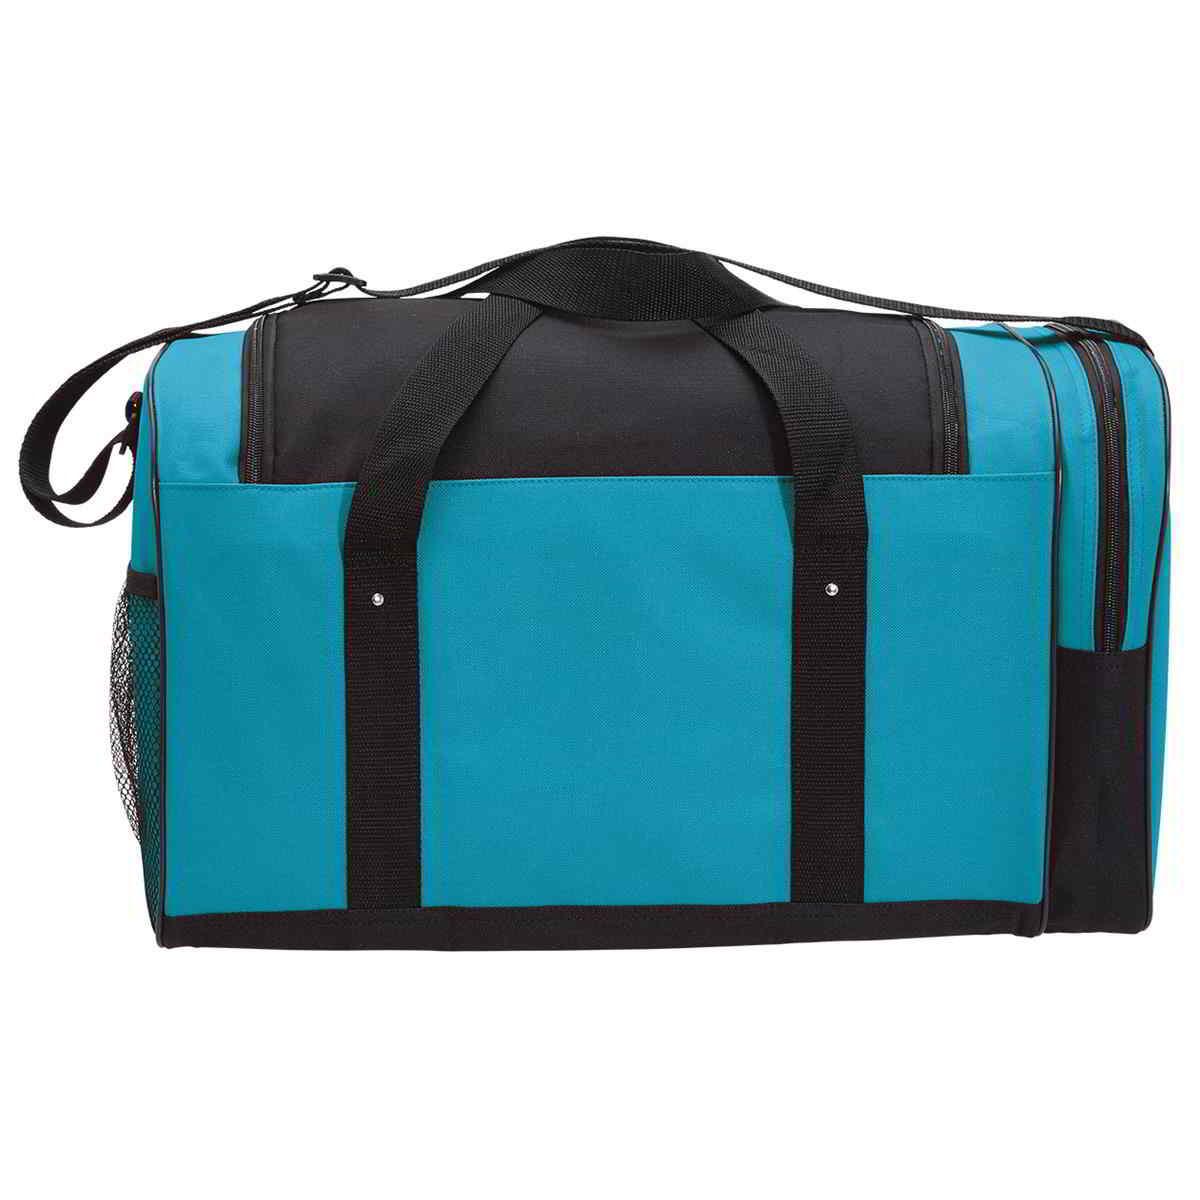 aQUA bLACK 1222 Spark Sports Bag